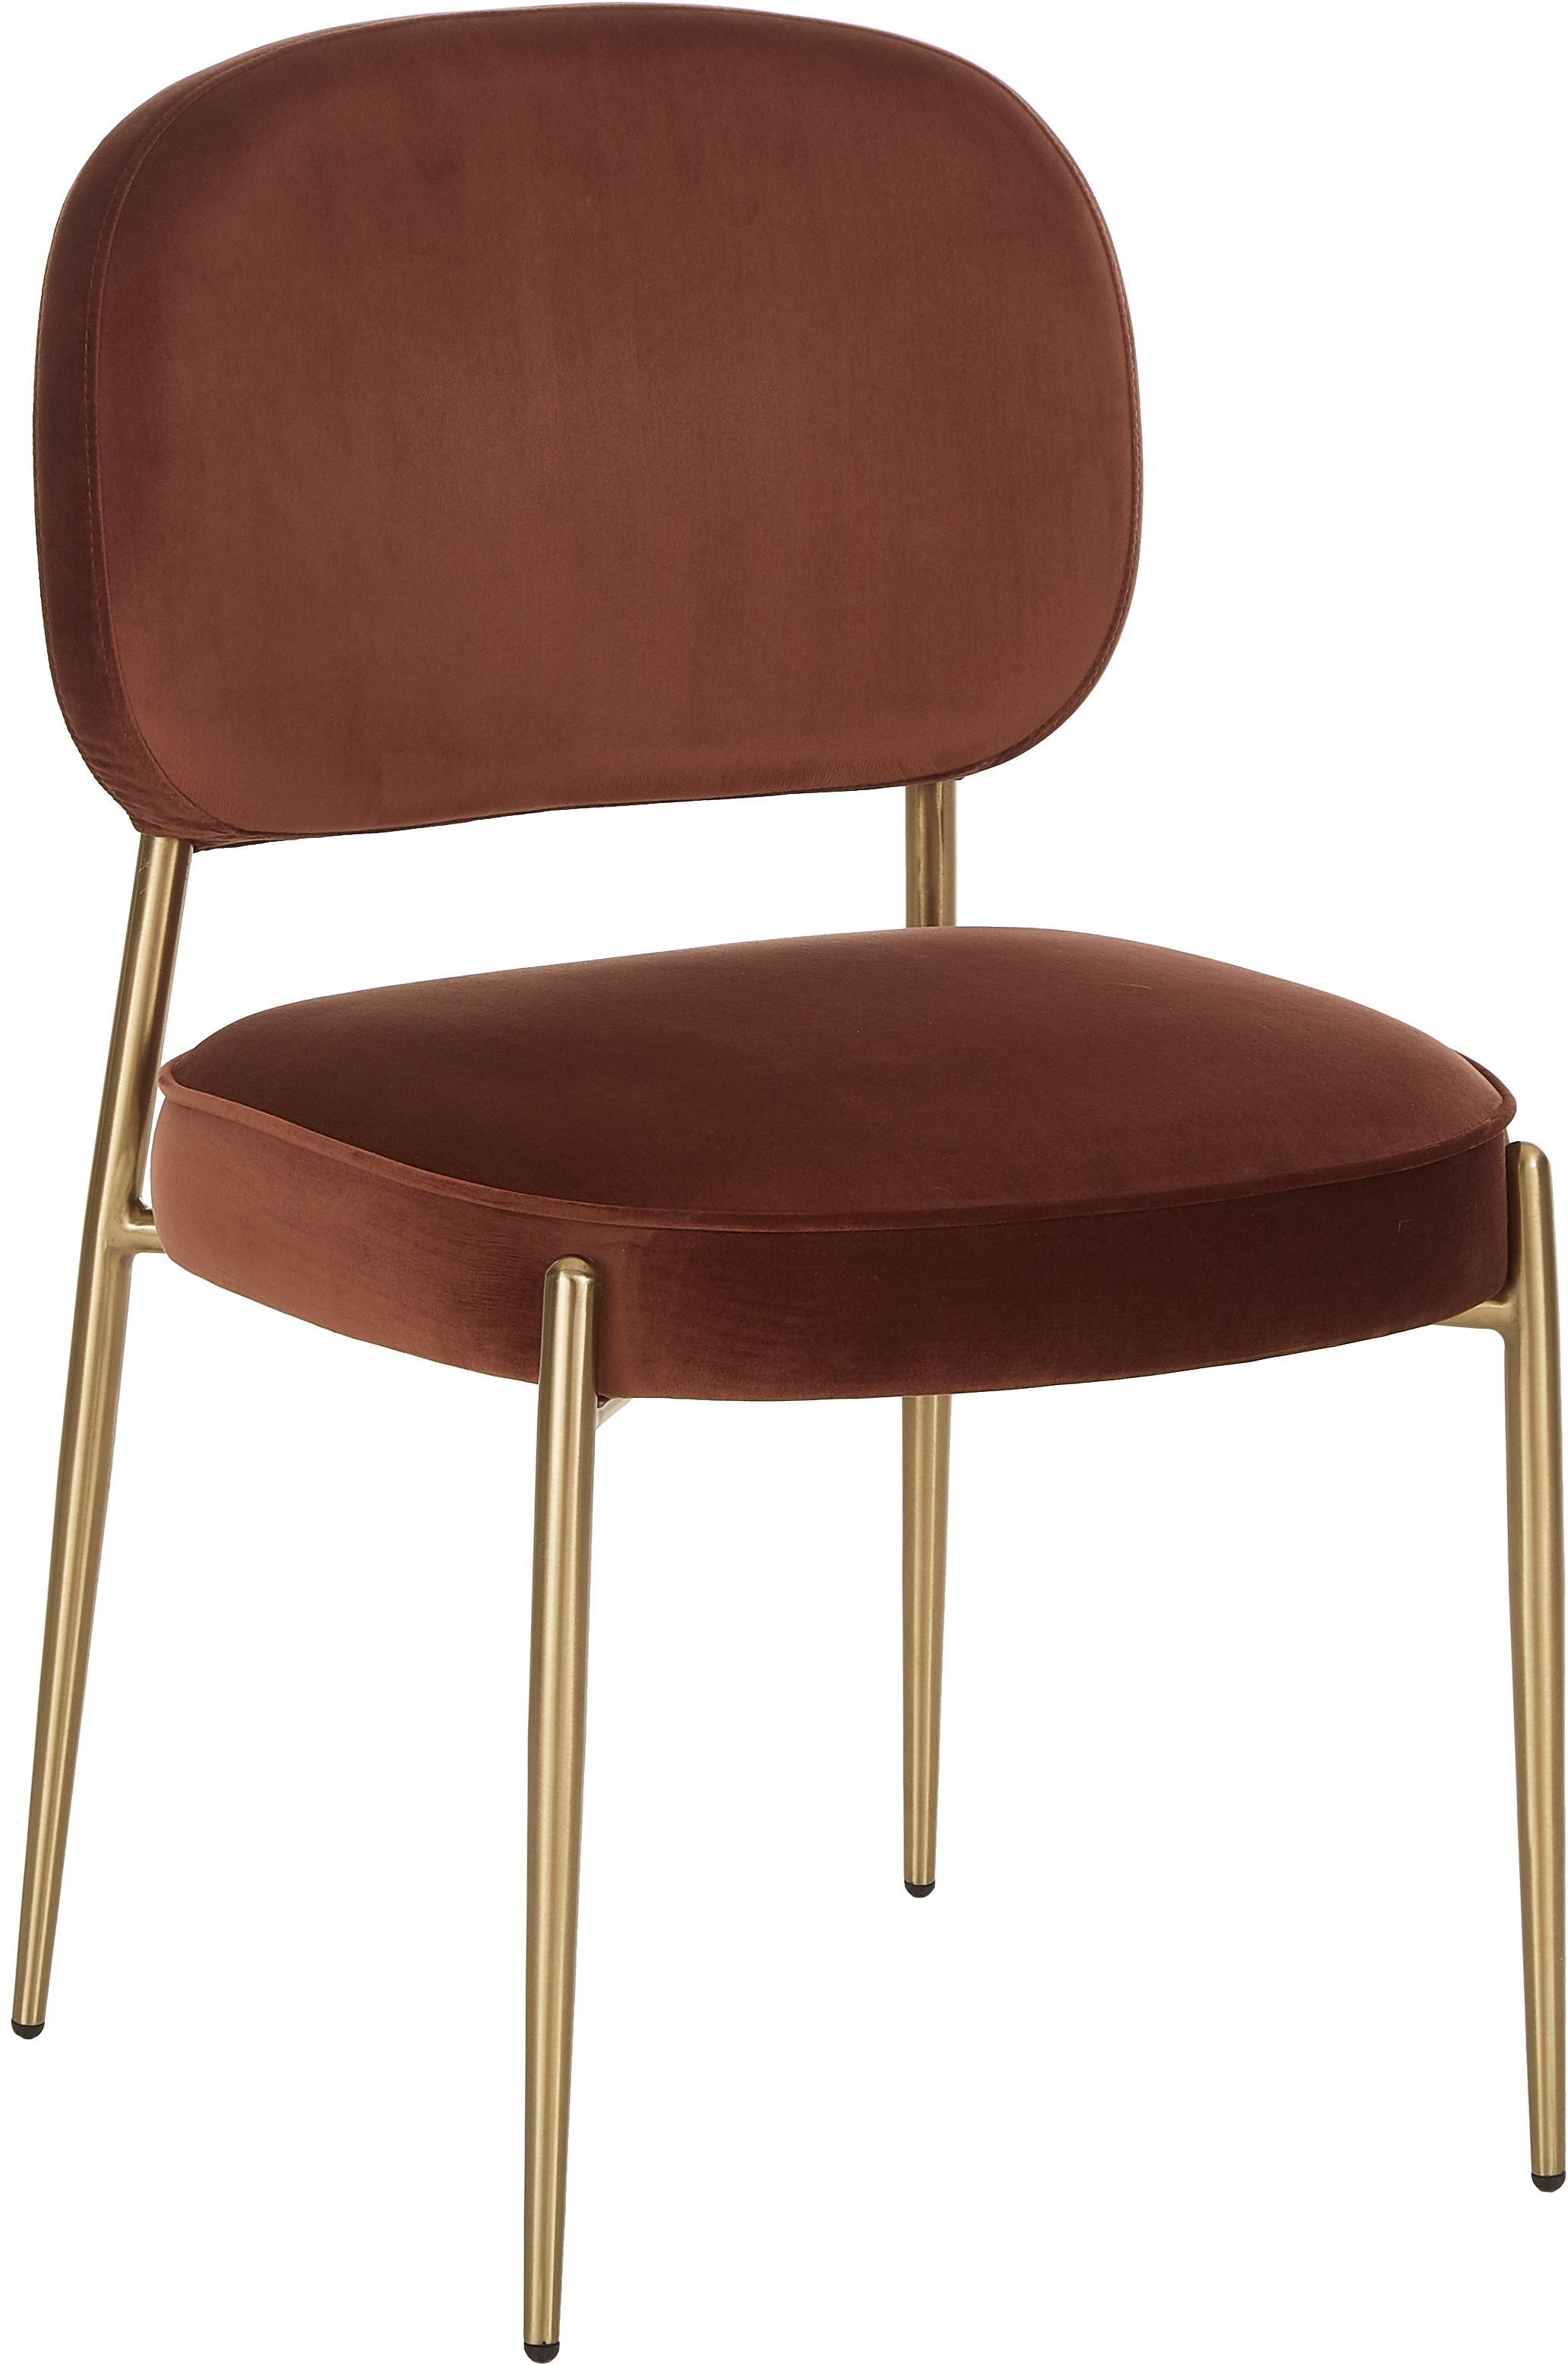 Sedia imbottita in velluto Viggo, Rivestimento: velluto (poliestere) 50.0, Velluto marrone, gambe oro, Larg. 49 x Prof. 66 cm